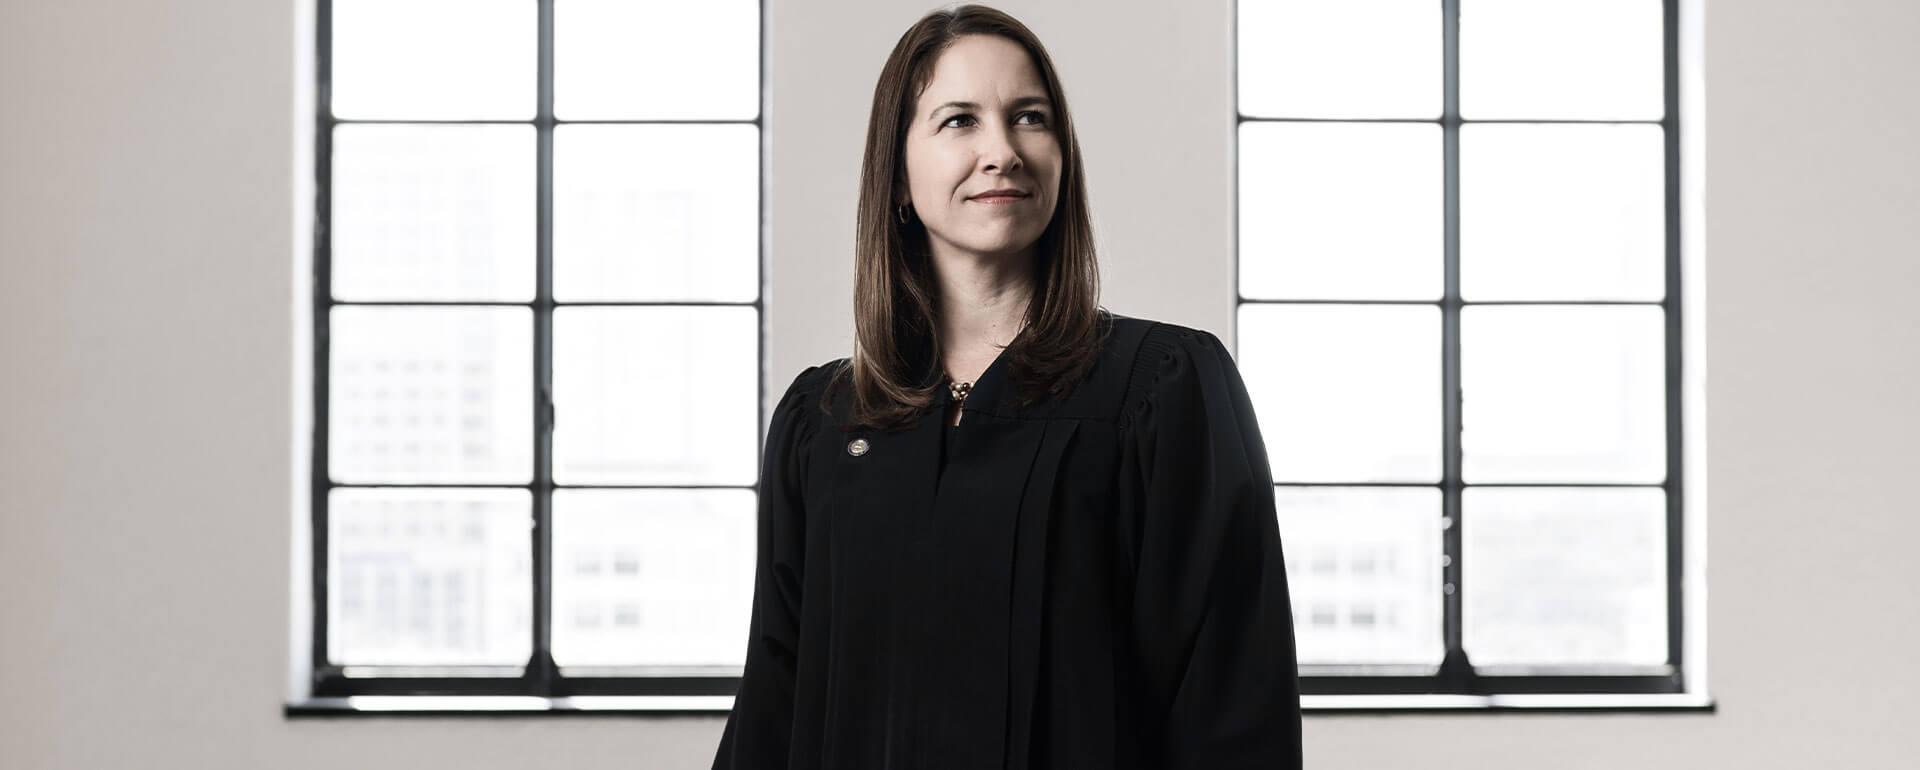 Judge Crump